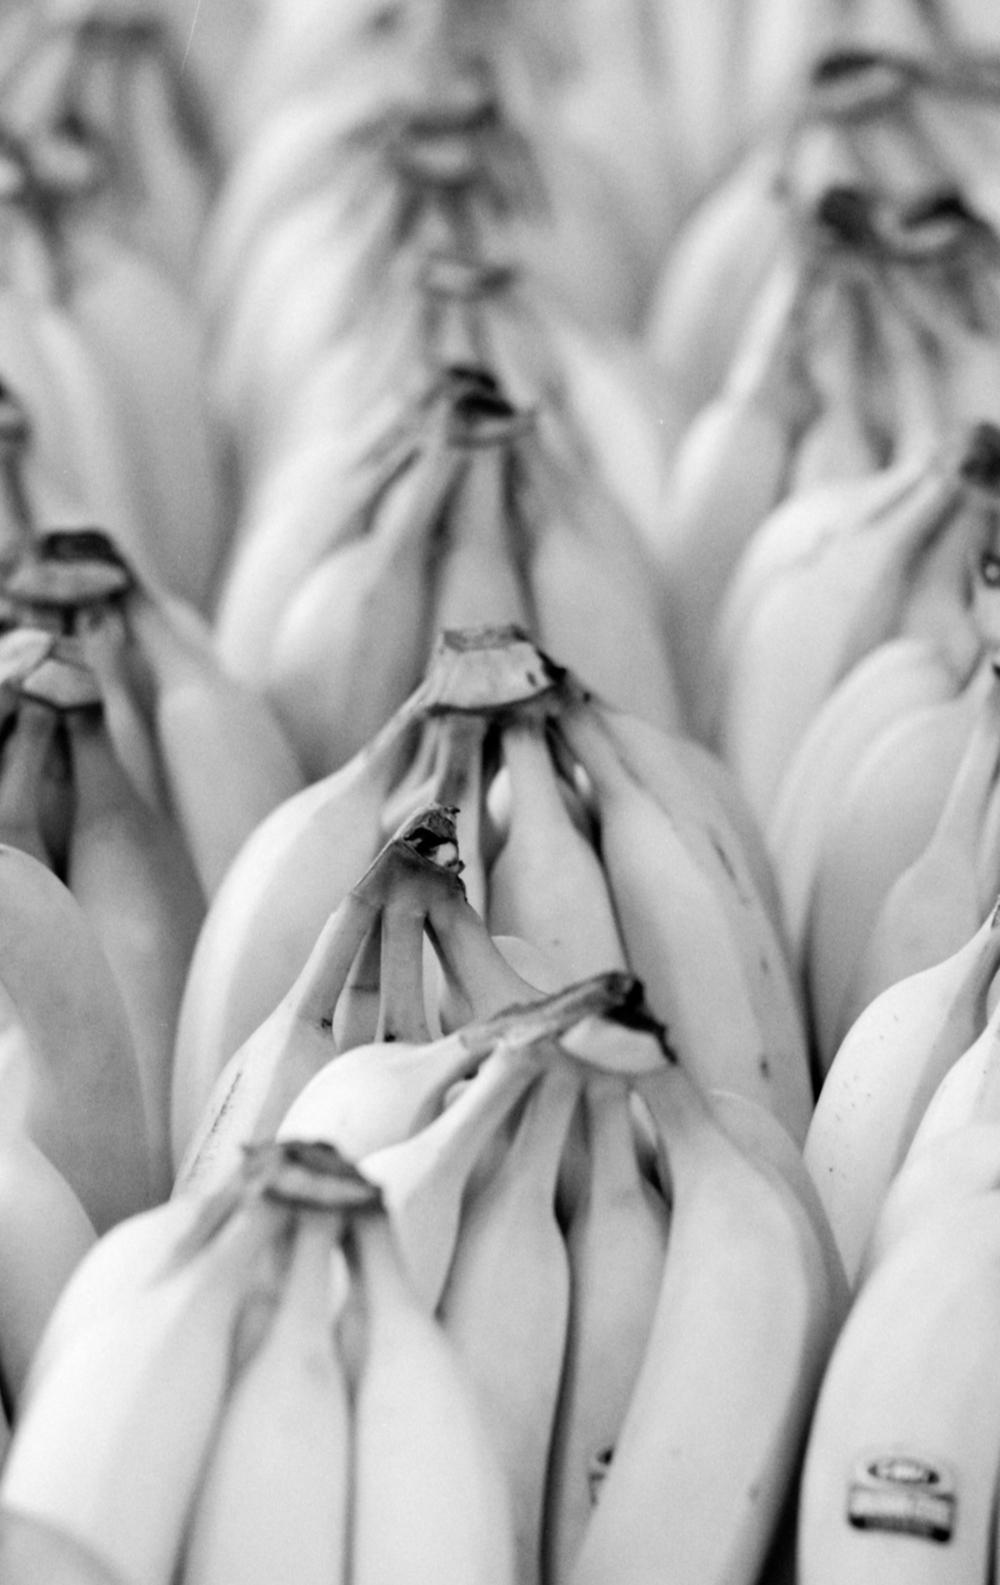 Achim Burkard |Banana |Minolta SRT101 |Ilford Delta Pro 400